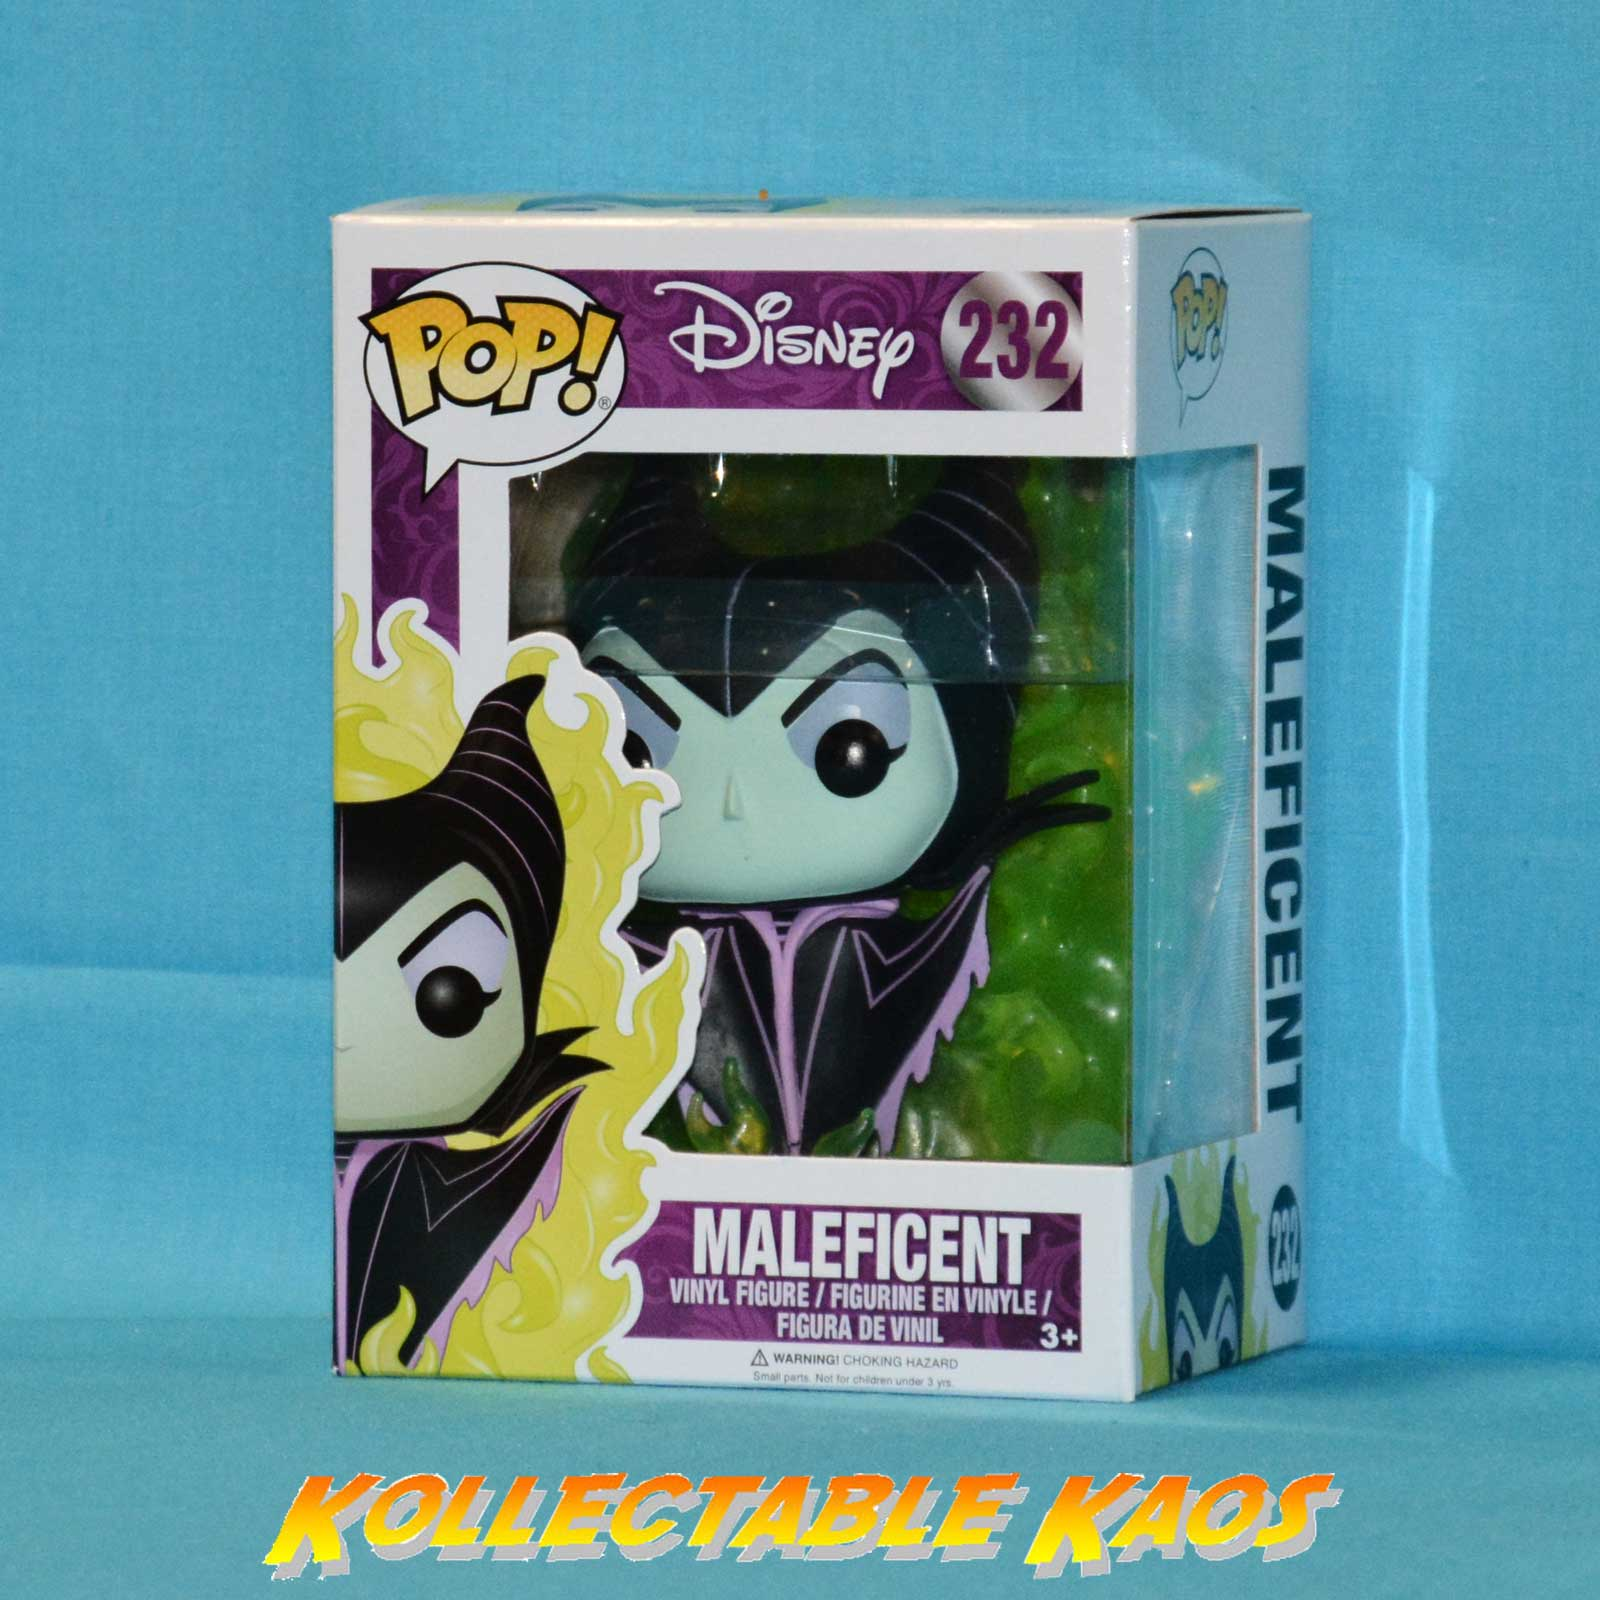 Sleeping Beauty Maleficent New Pop Vinyl Figure Rs